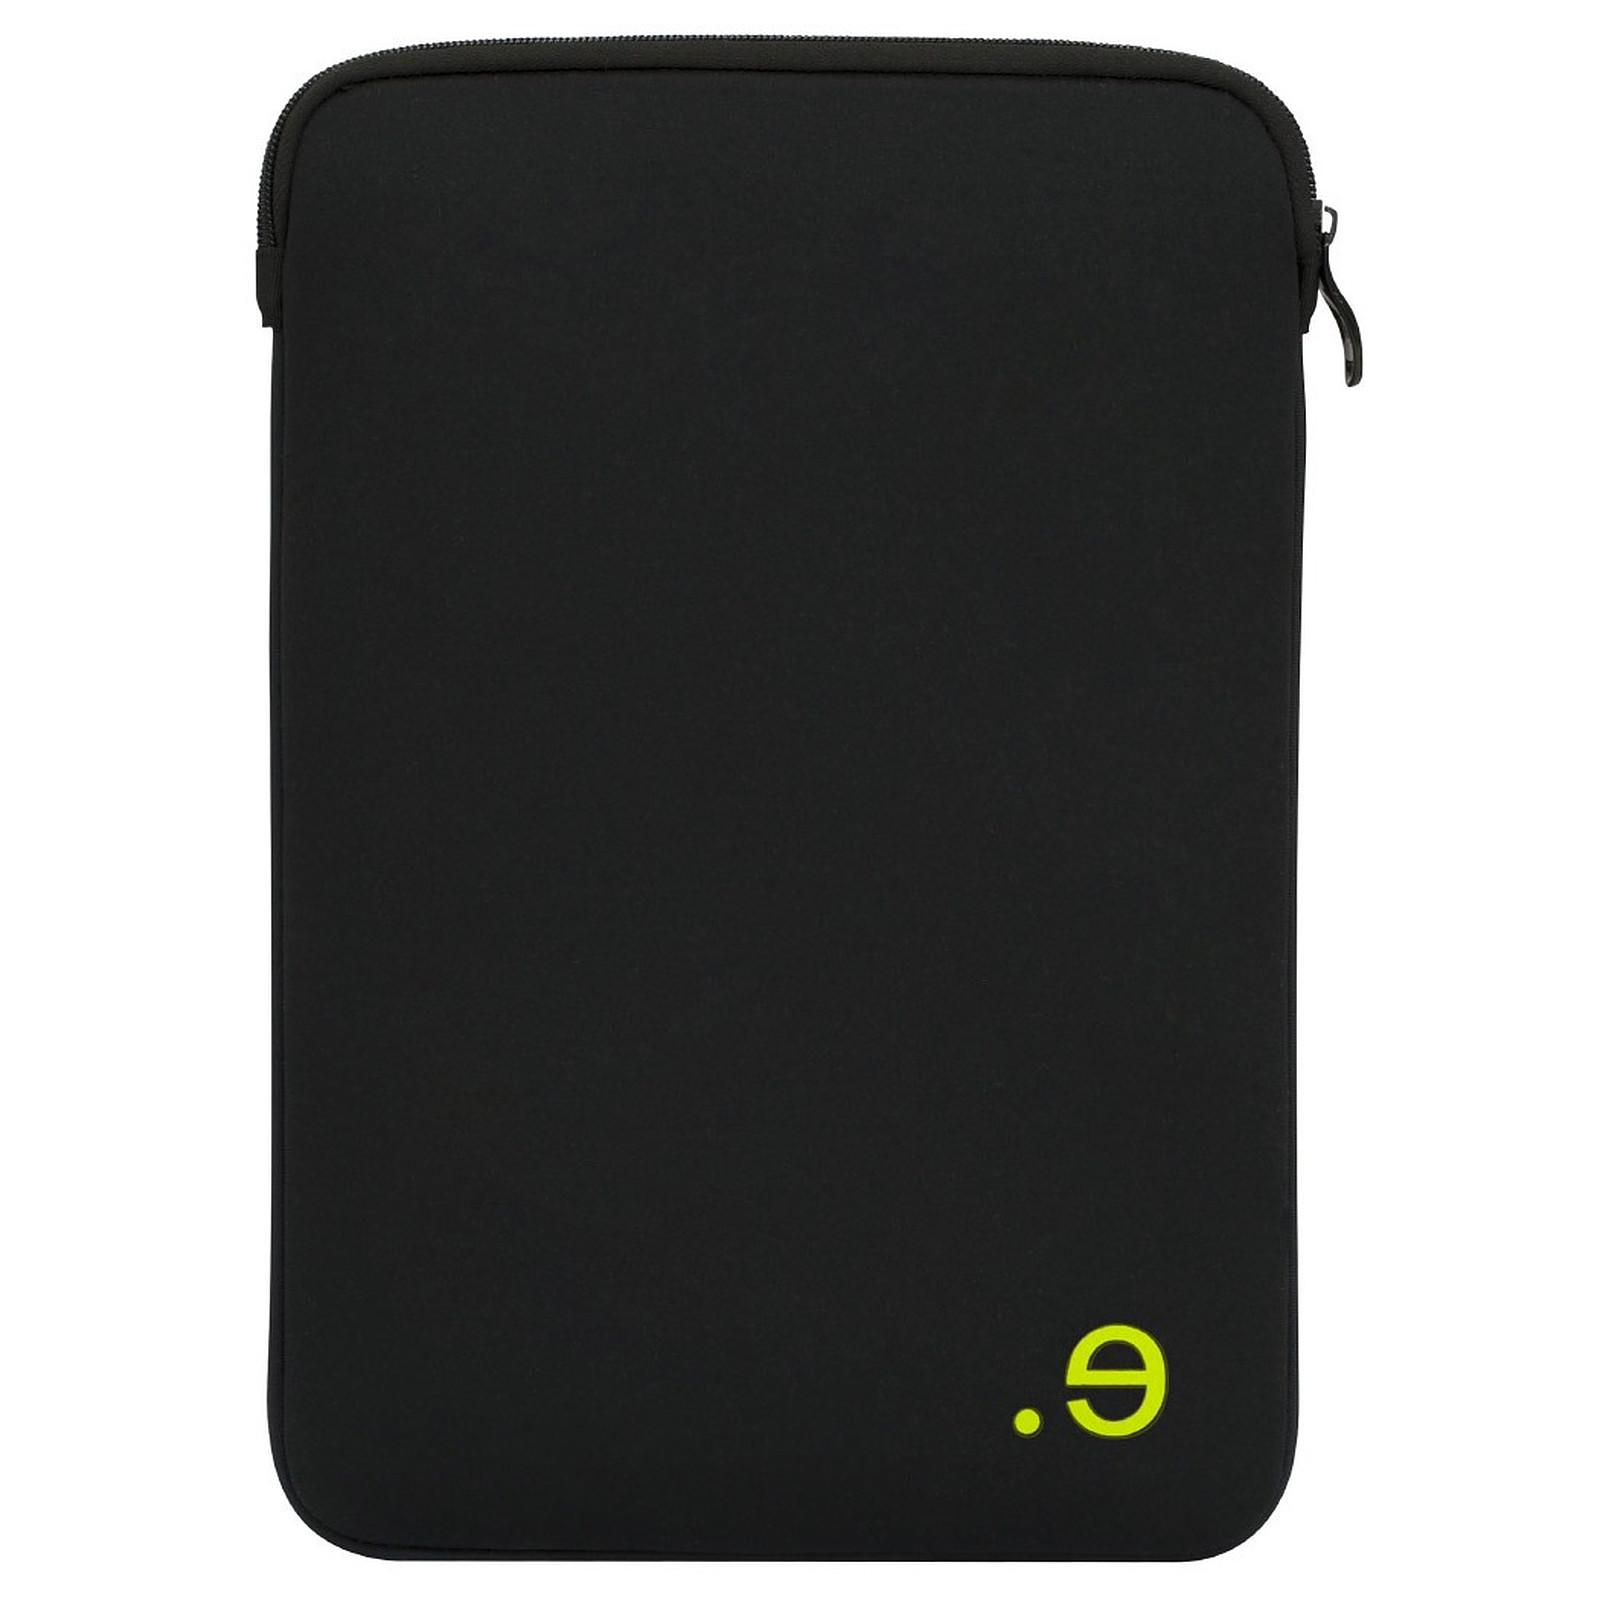 be.ez LA robe Tablet Creativa